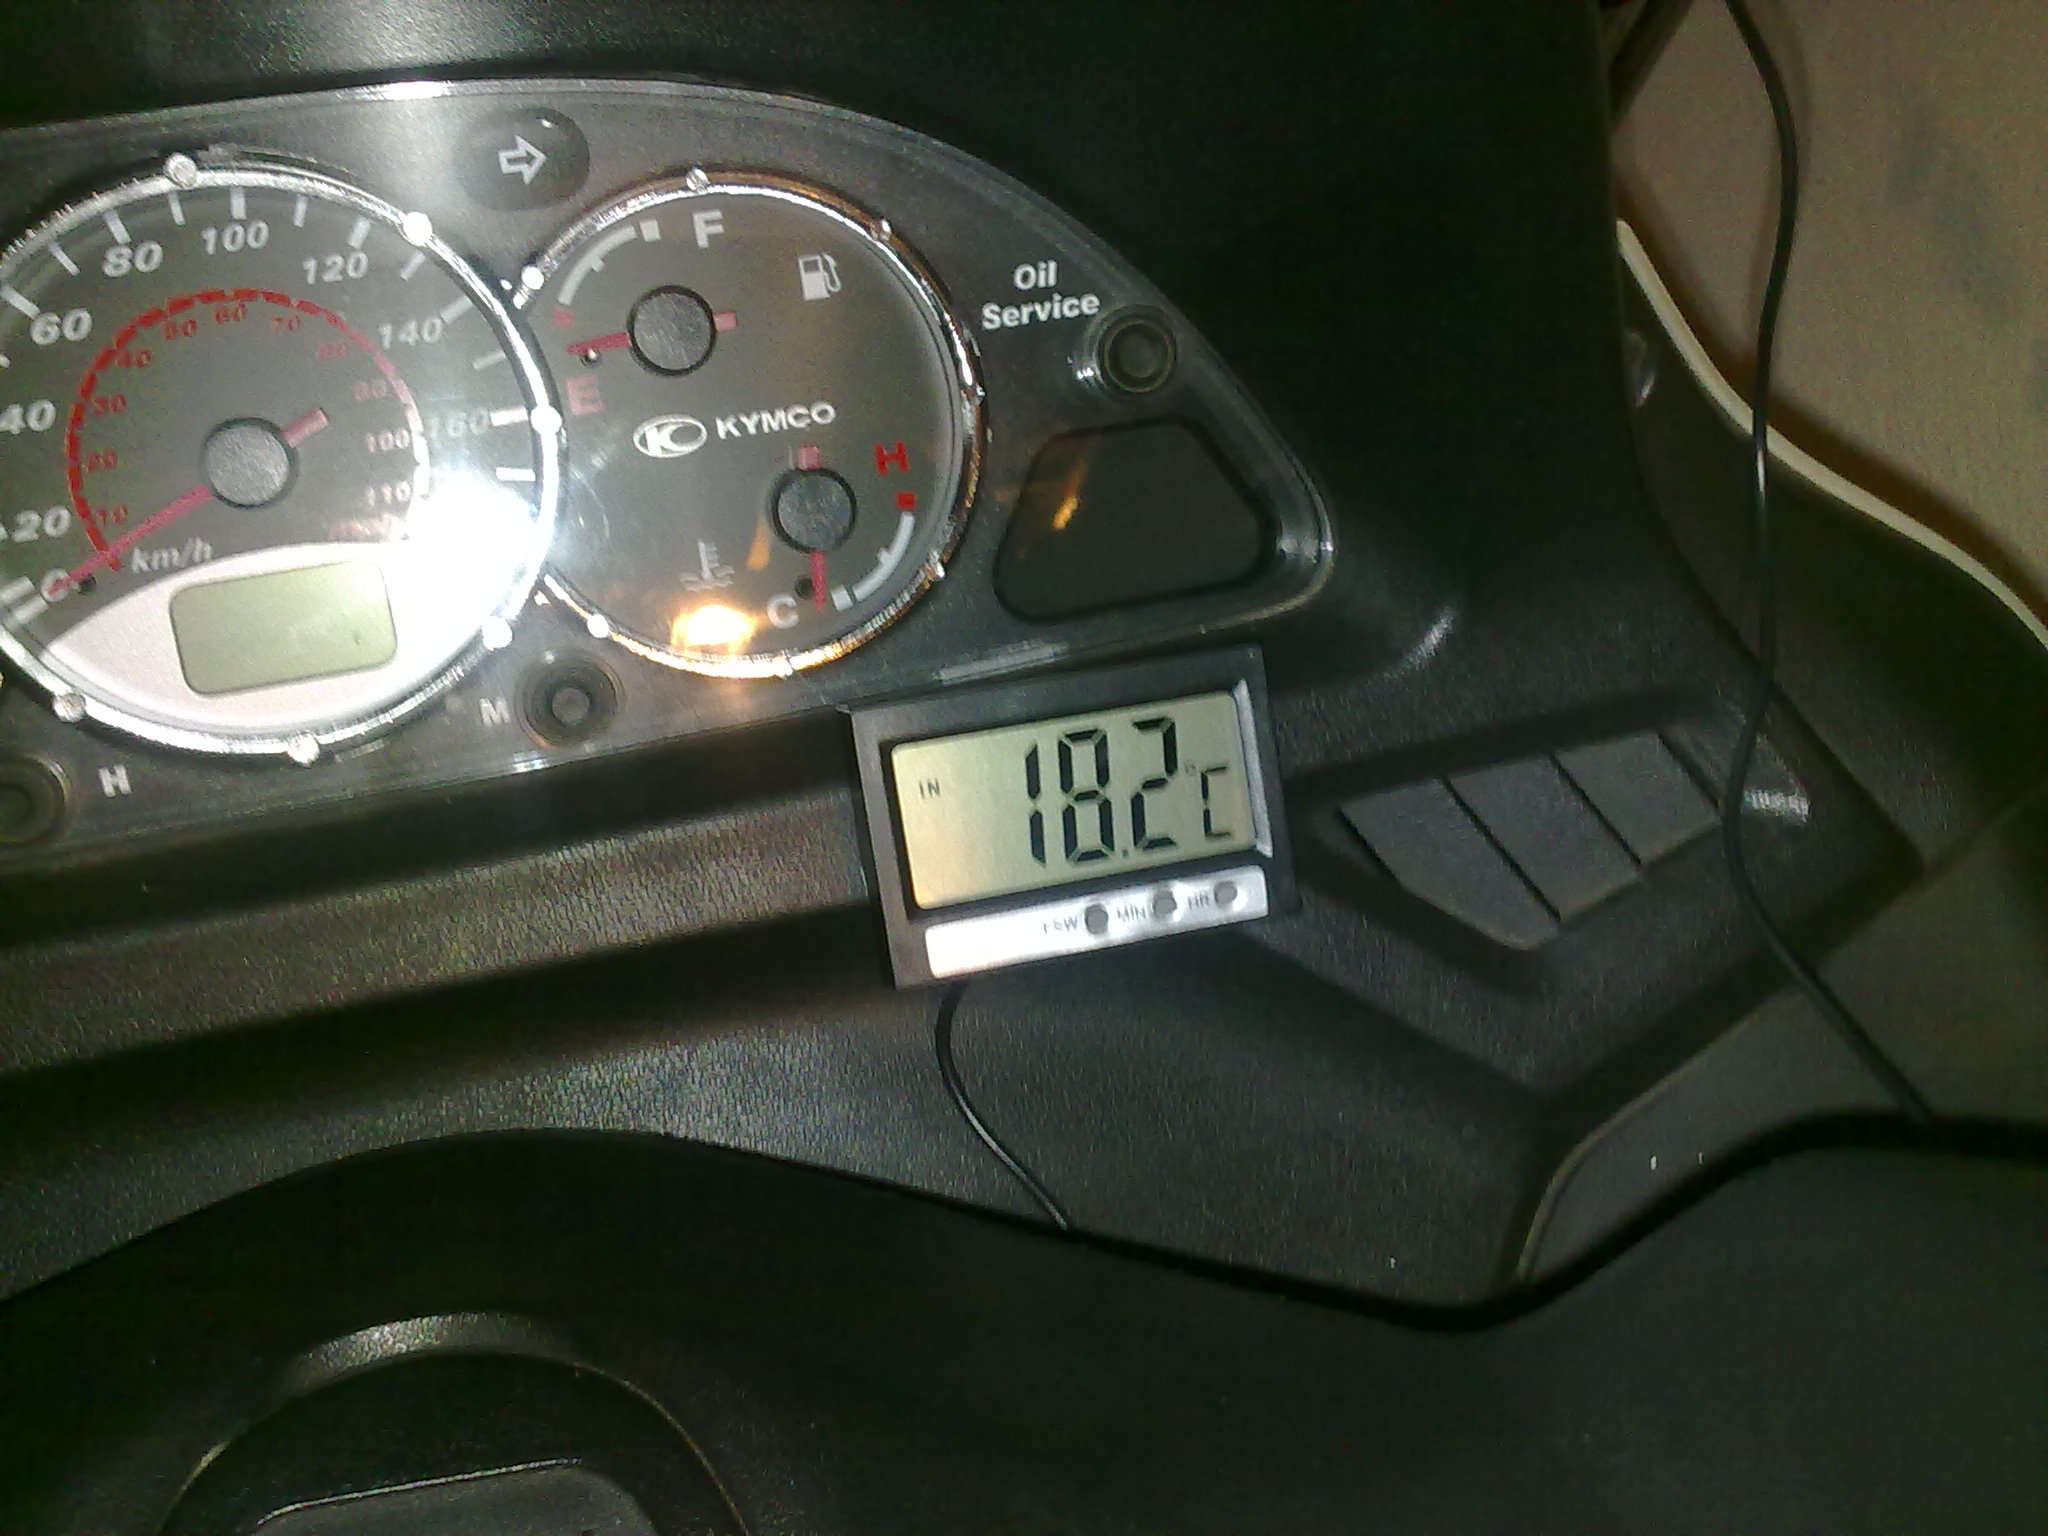 Accesorios tuning termometro exterior bajo la cupula - Termometro interior exterior ...